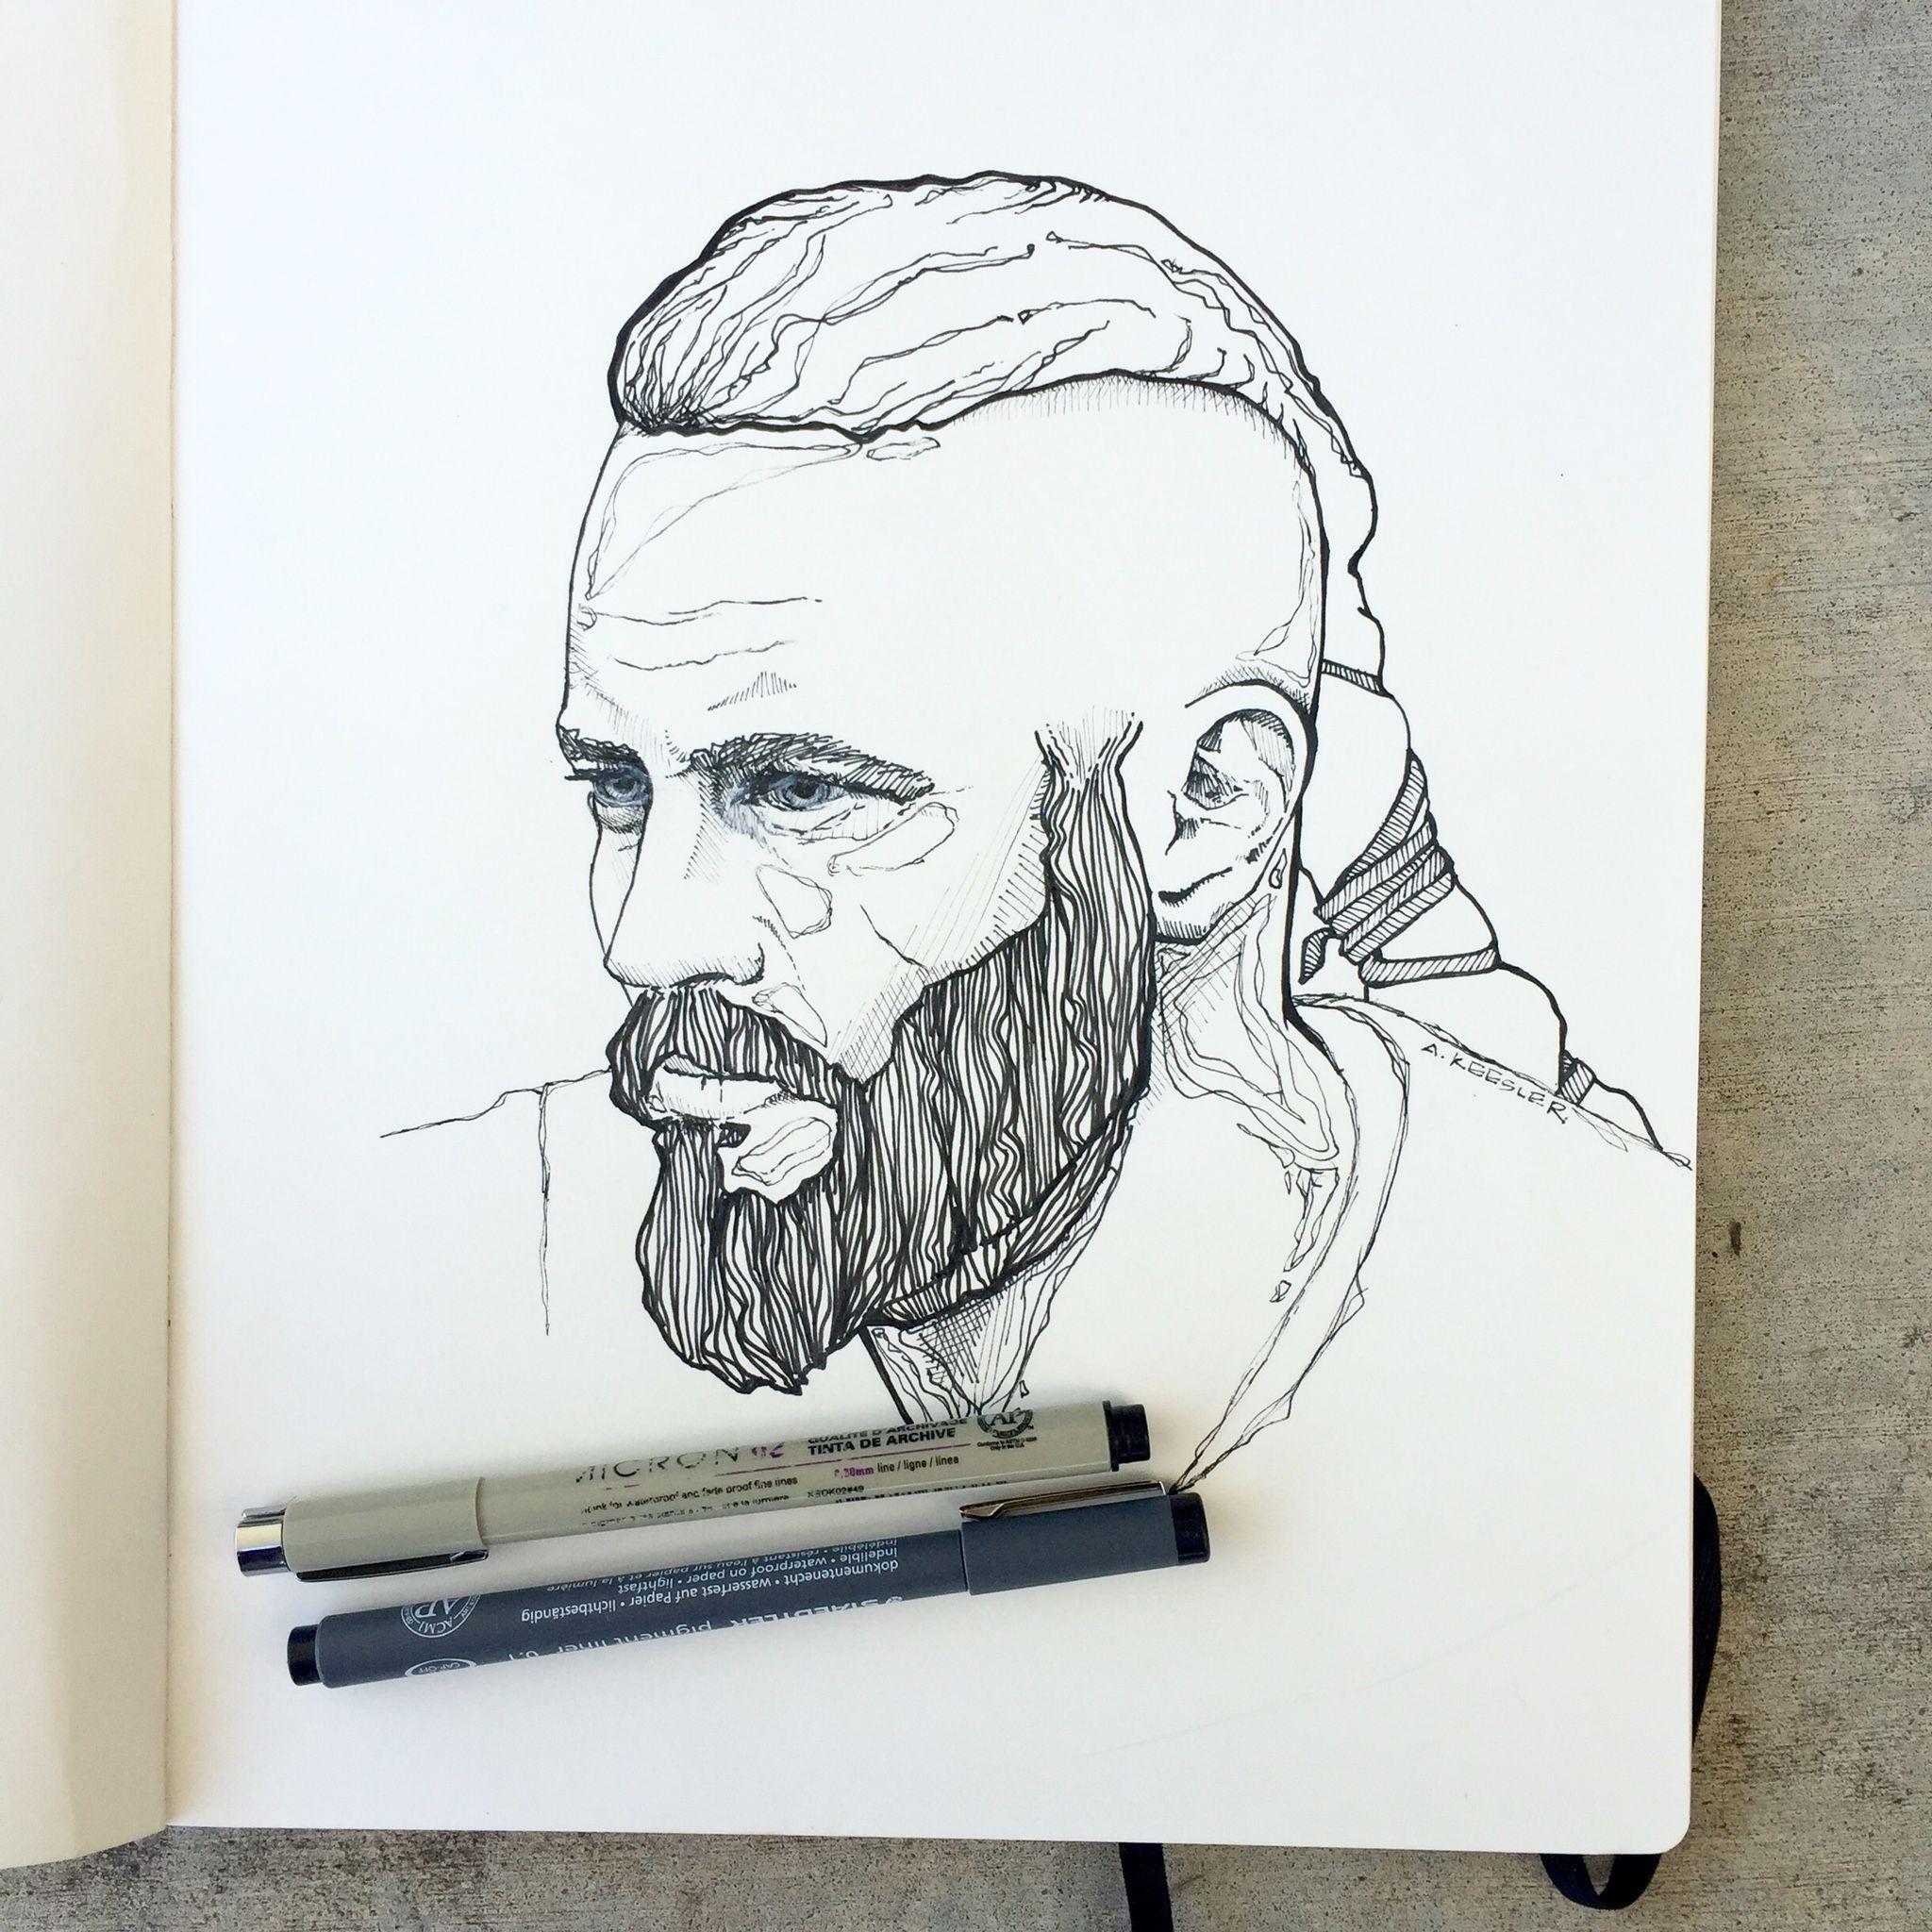 Ragnar Lothbrok, Vikings, vikings art, ink drawing, sketchbook, moleskin, micron pens, Vikings fan art